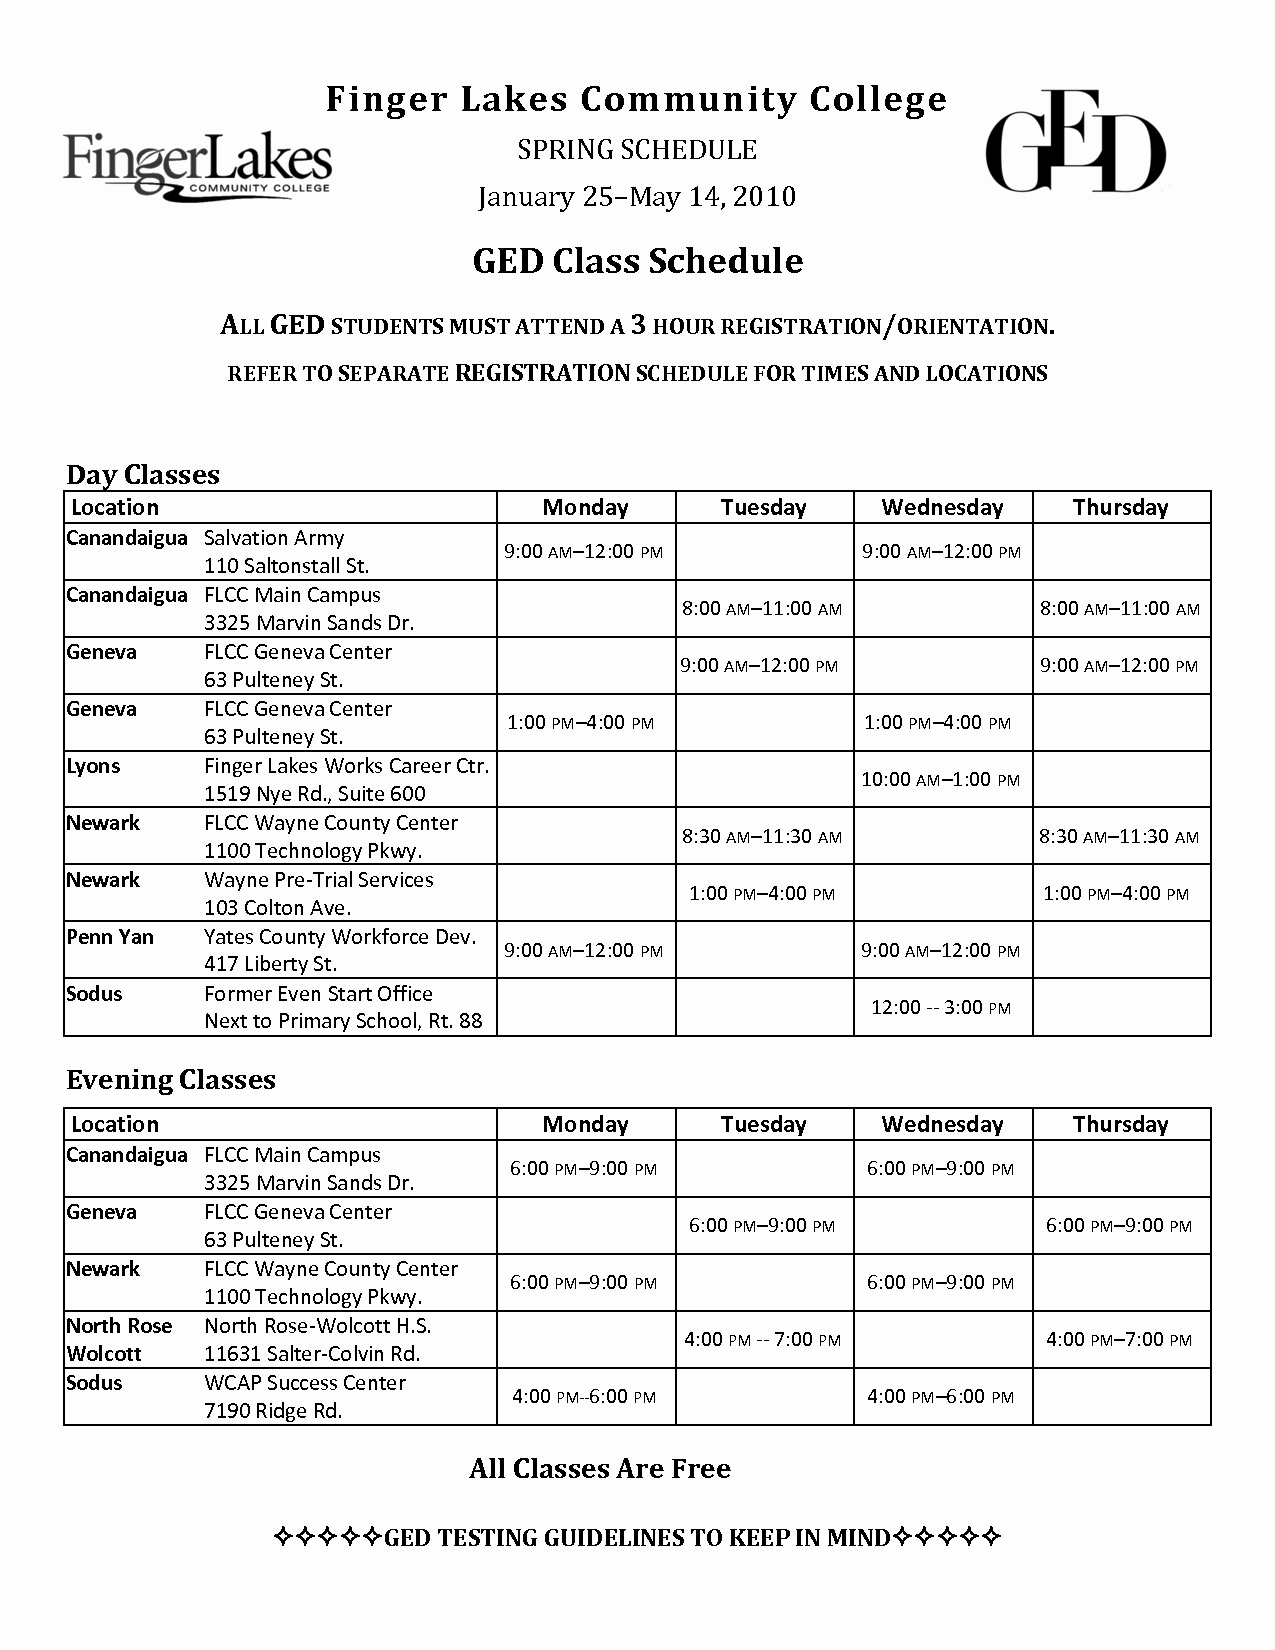 College Class Schedule Template Fresh 6 Best Of College Schedule Template Printable